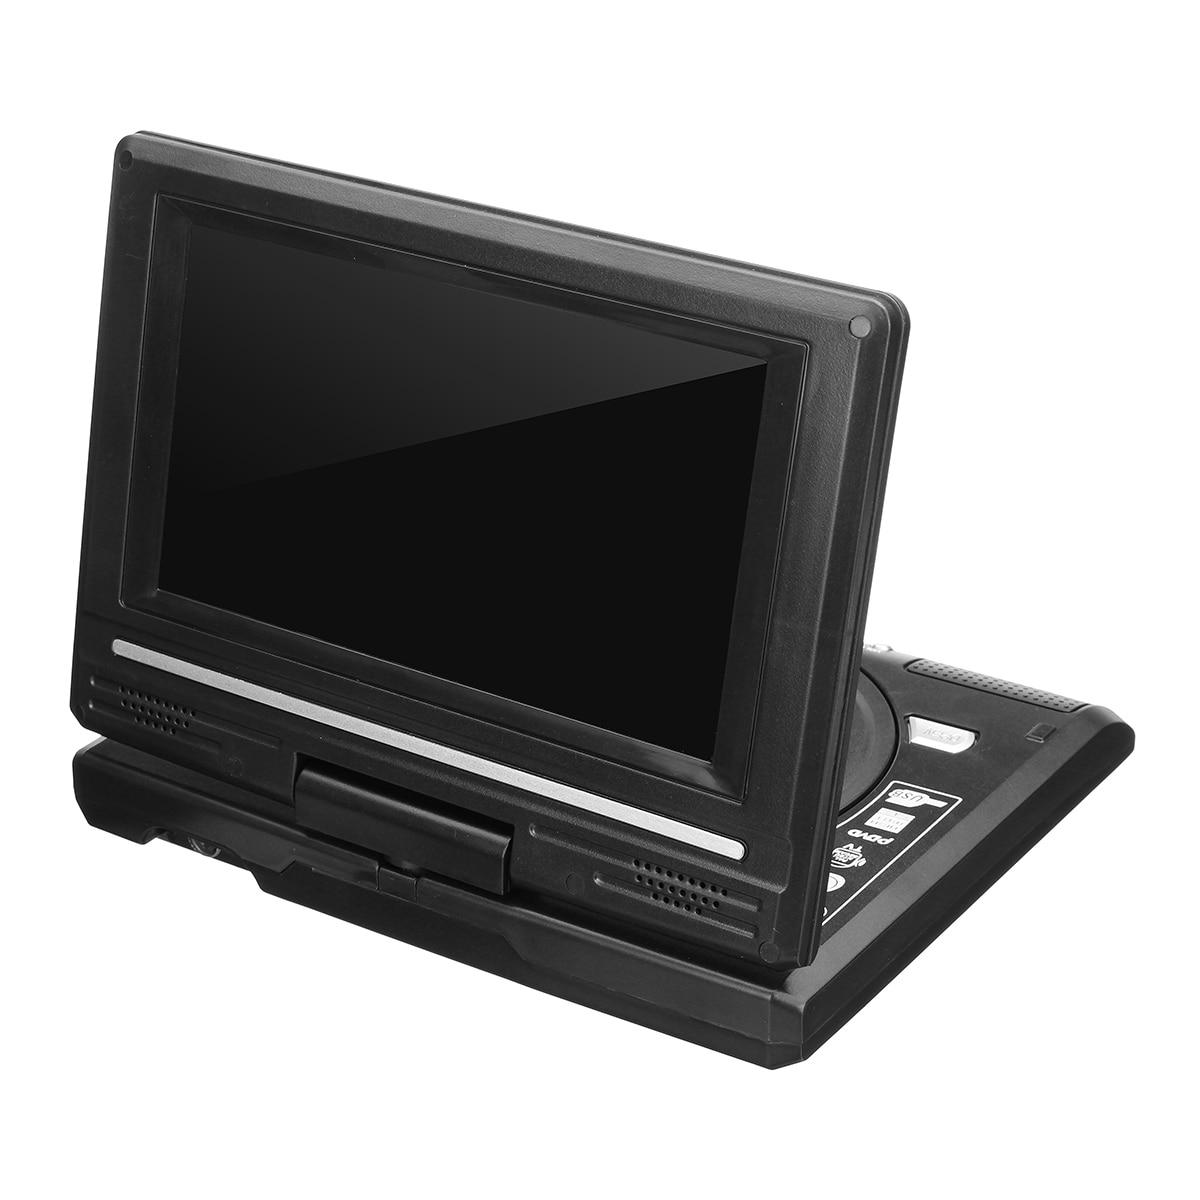 Portátil de 7,8 pulgadas HD TV casa coche reproductor de DVD VCD CD MP3 DVD USB SD reproductor de tarjetas RCA TV Portatil juego de Cable 16:9 pantalla LCD giratoria - 3